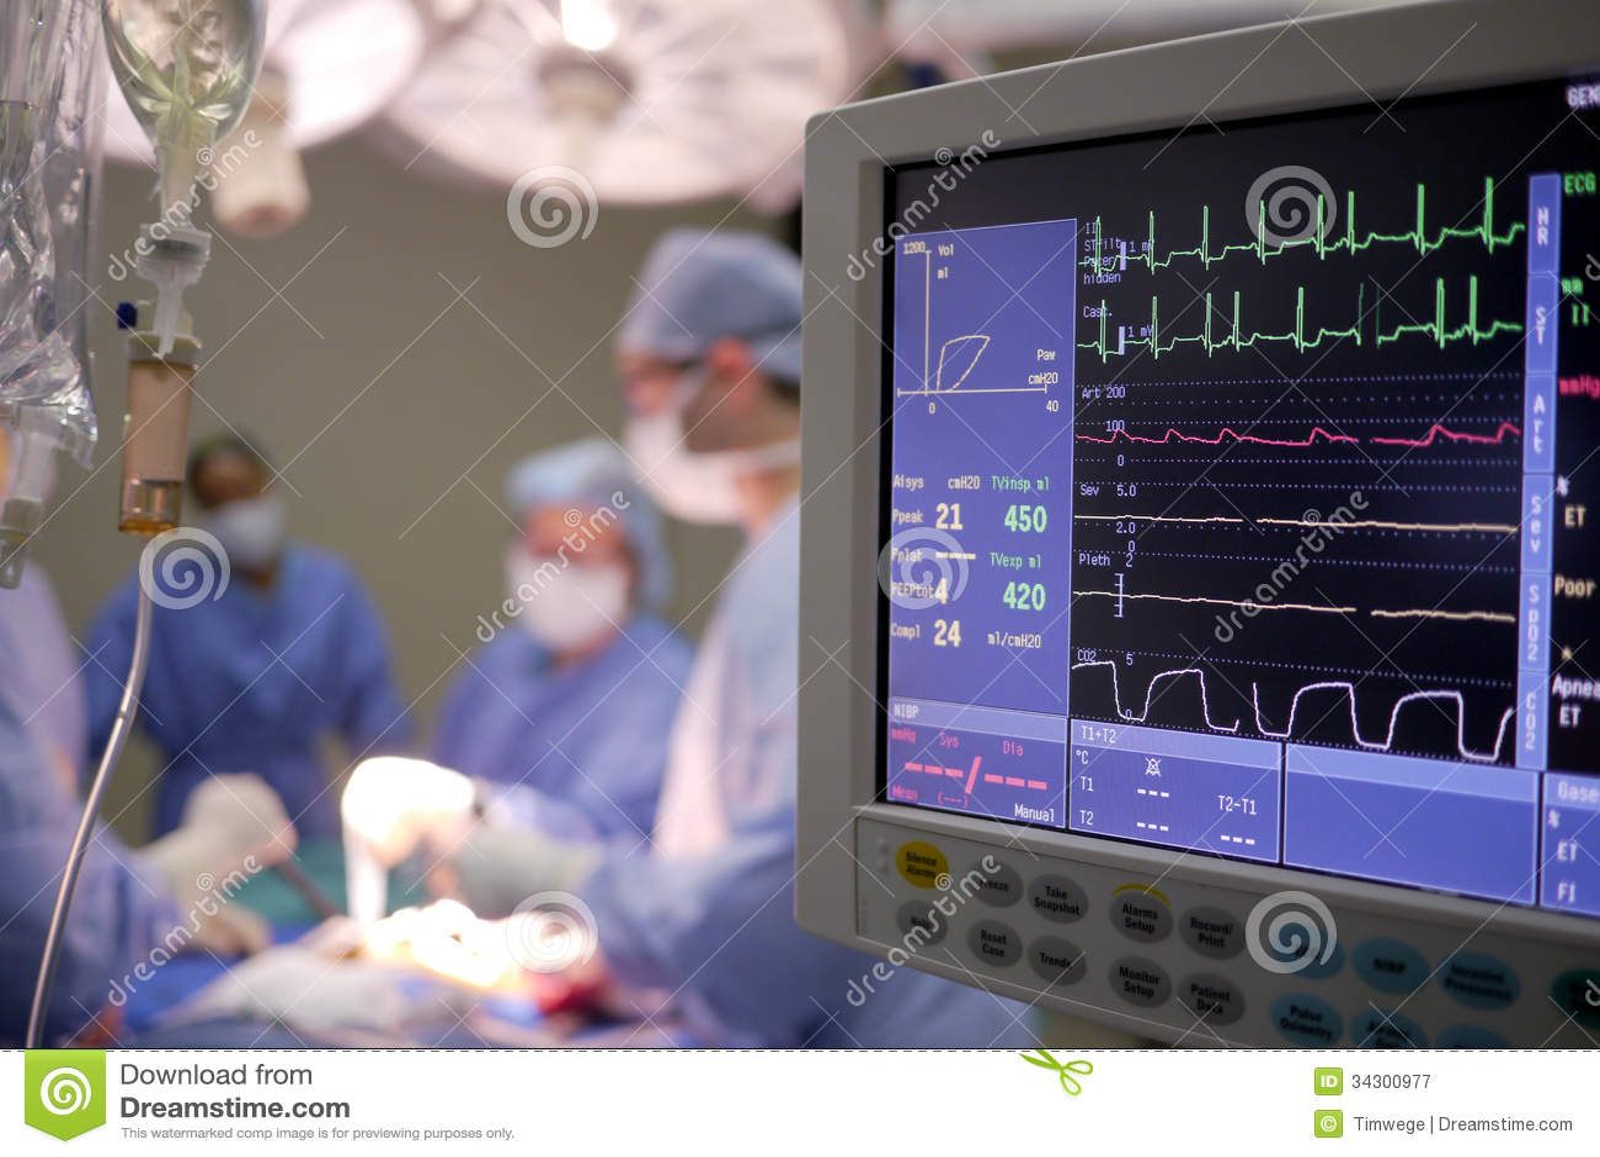 hospital chip machine